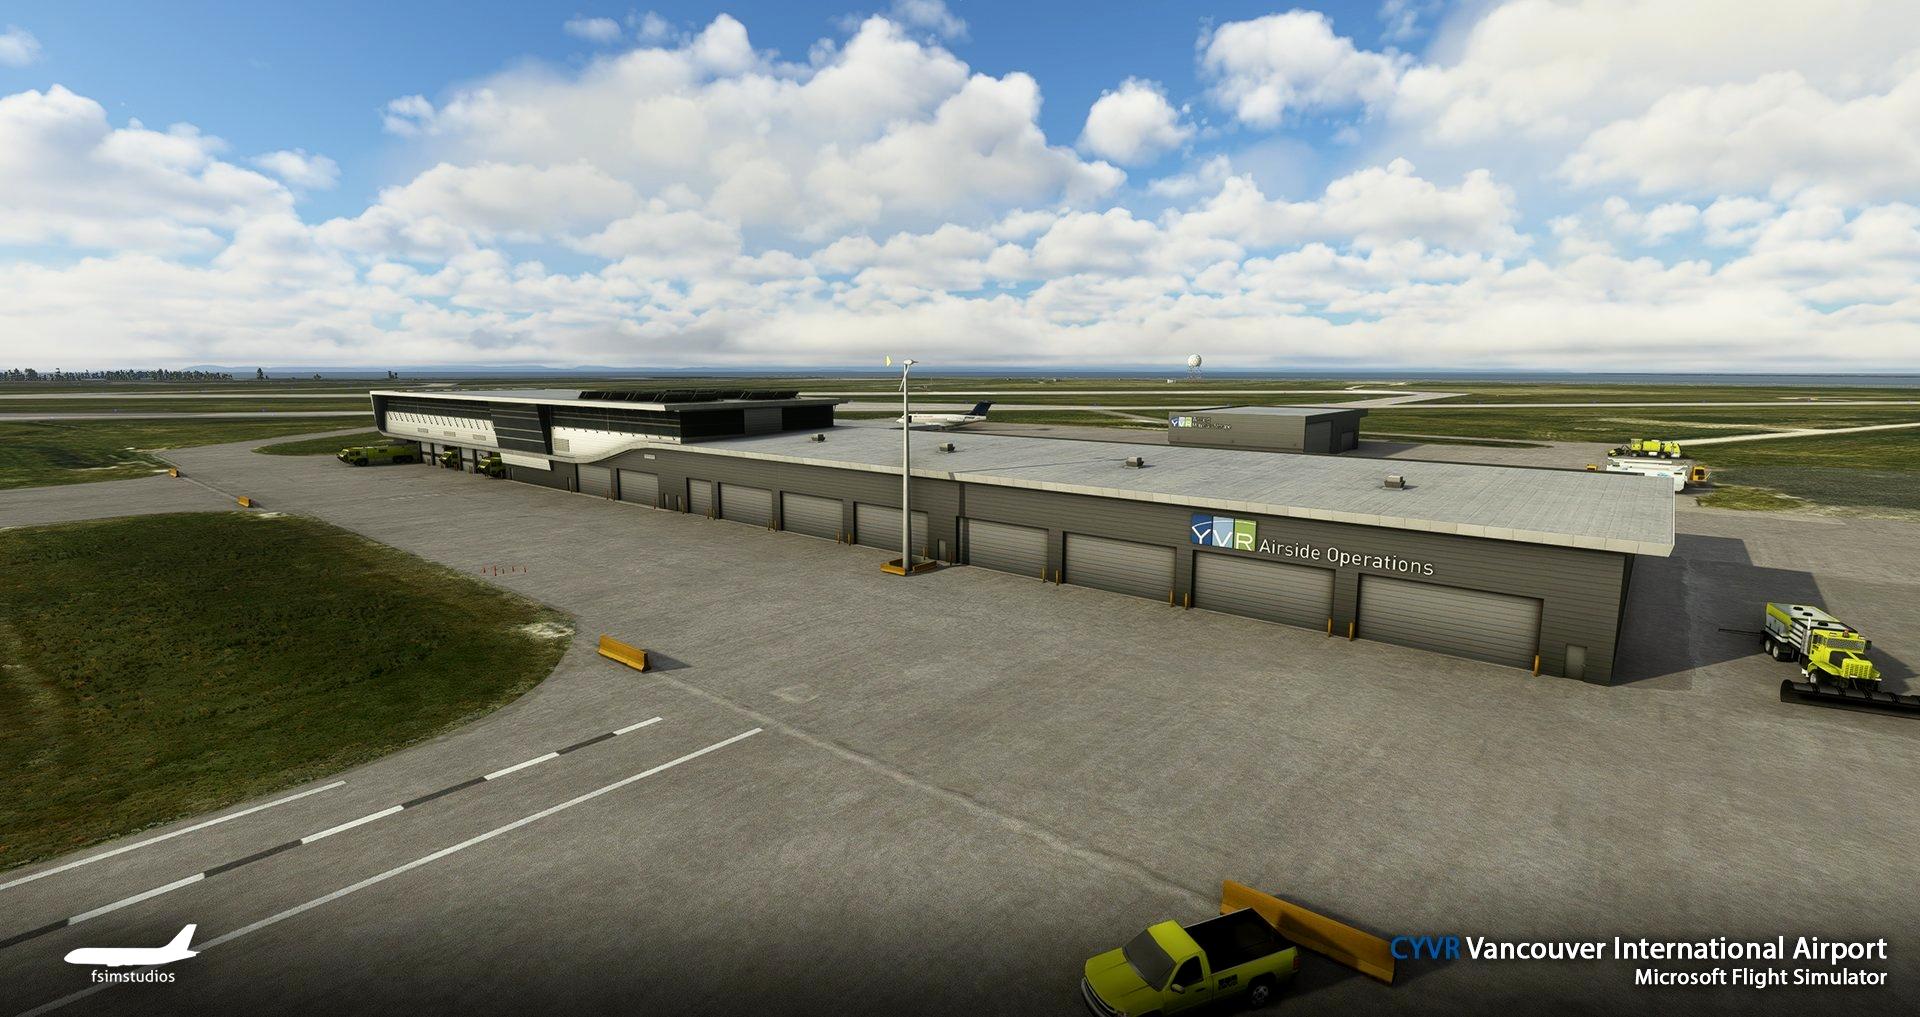 CYVR Vancouver International Airport